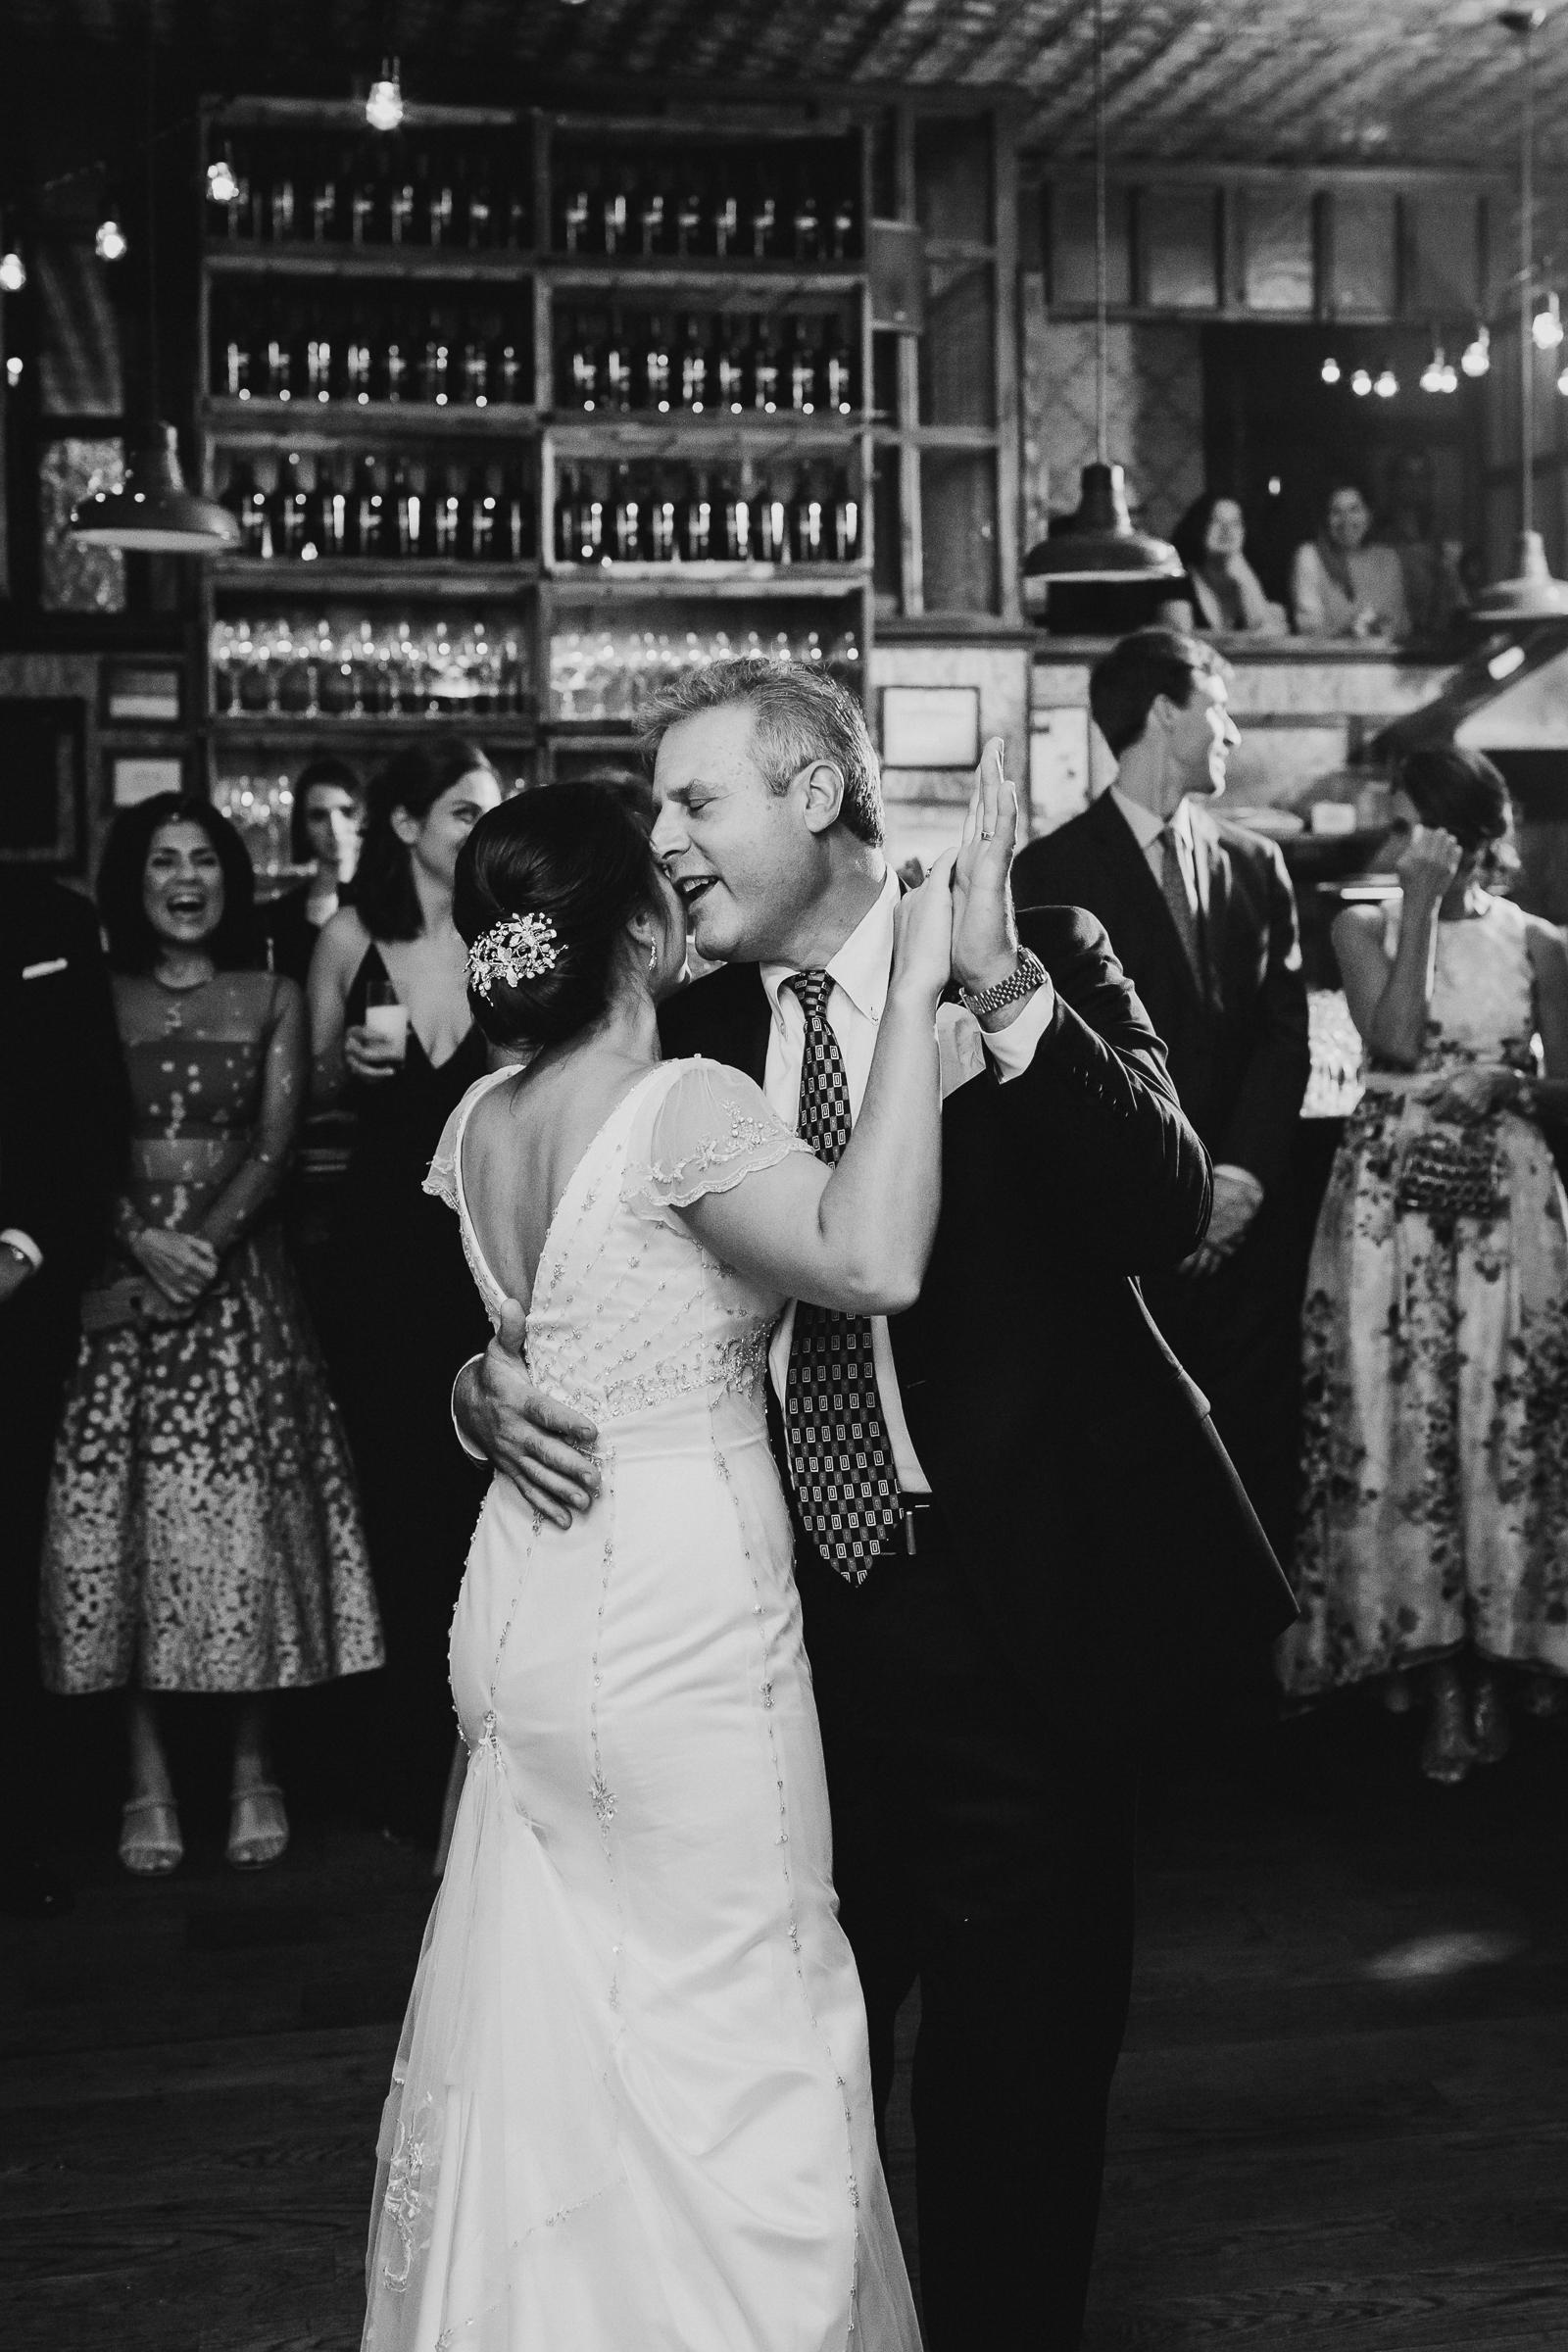 Brooklyn-Winery-NYC-Editorial-Documentary-Wedding-Photographer-Gina-Oli-105.jpg